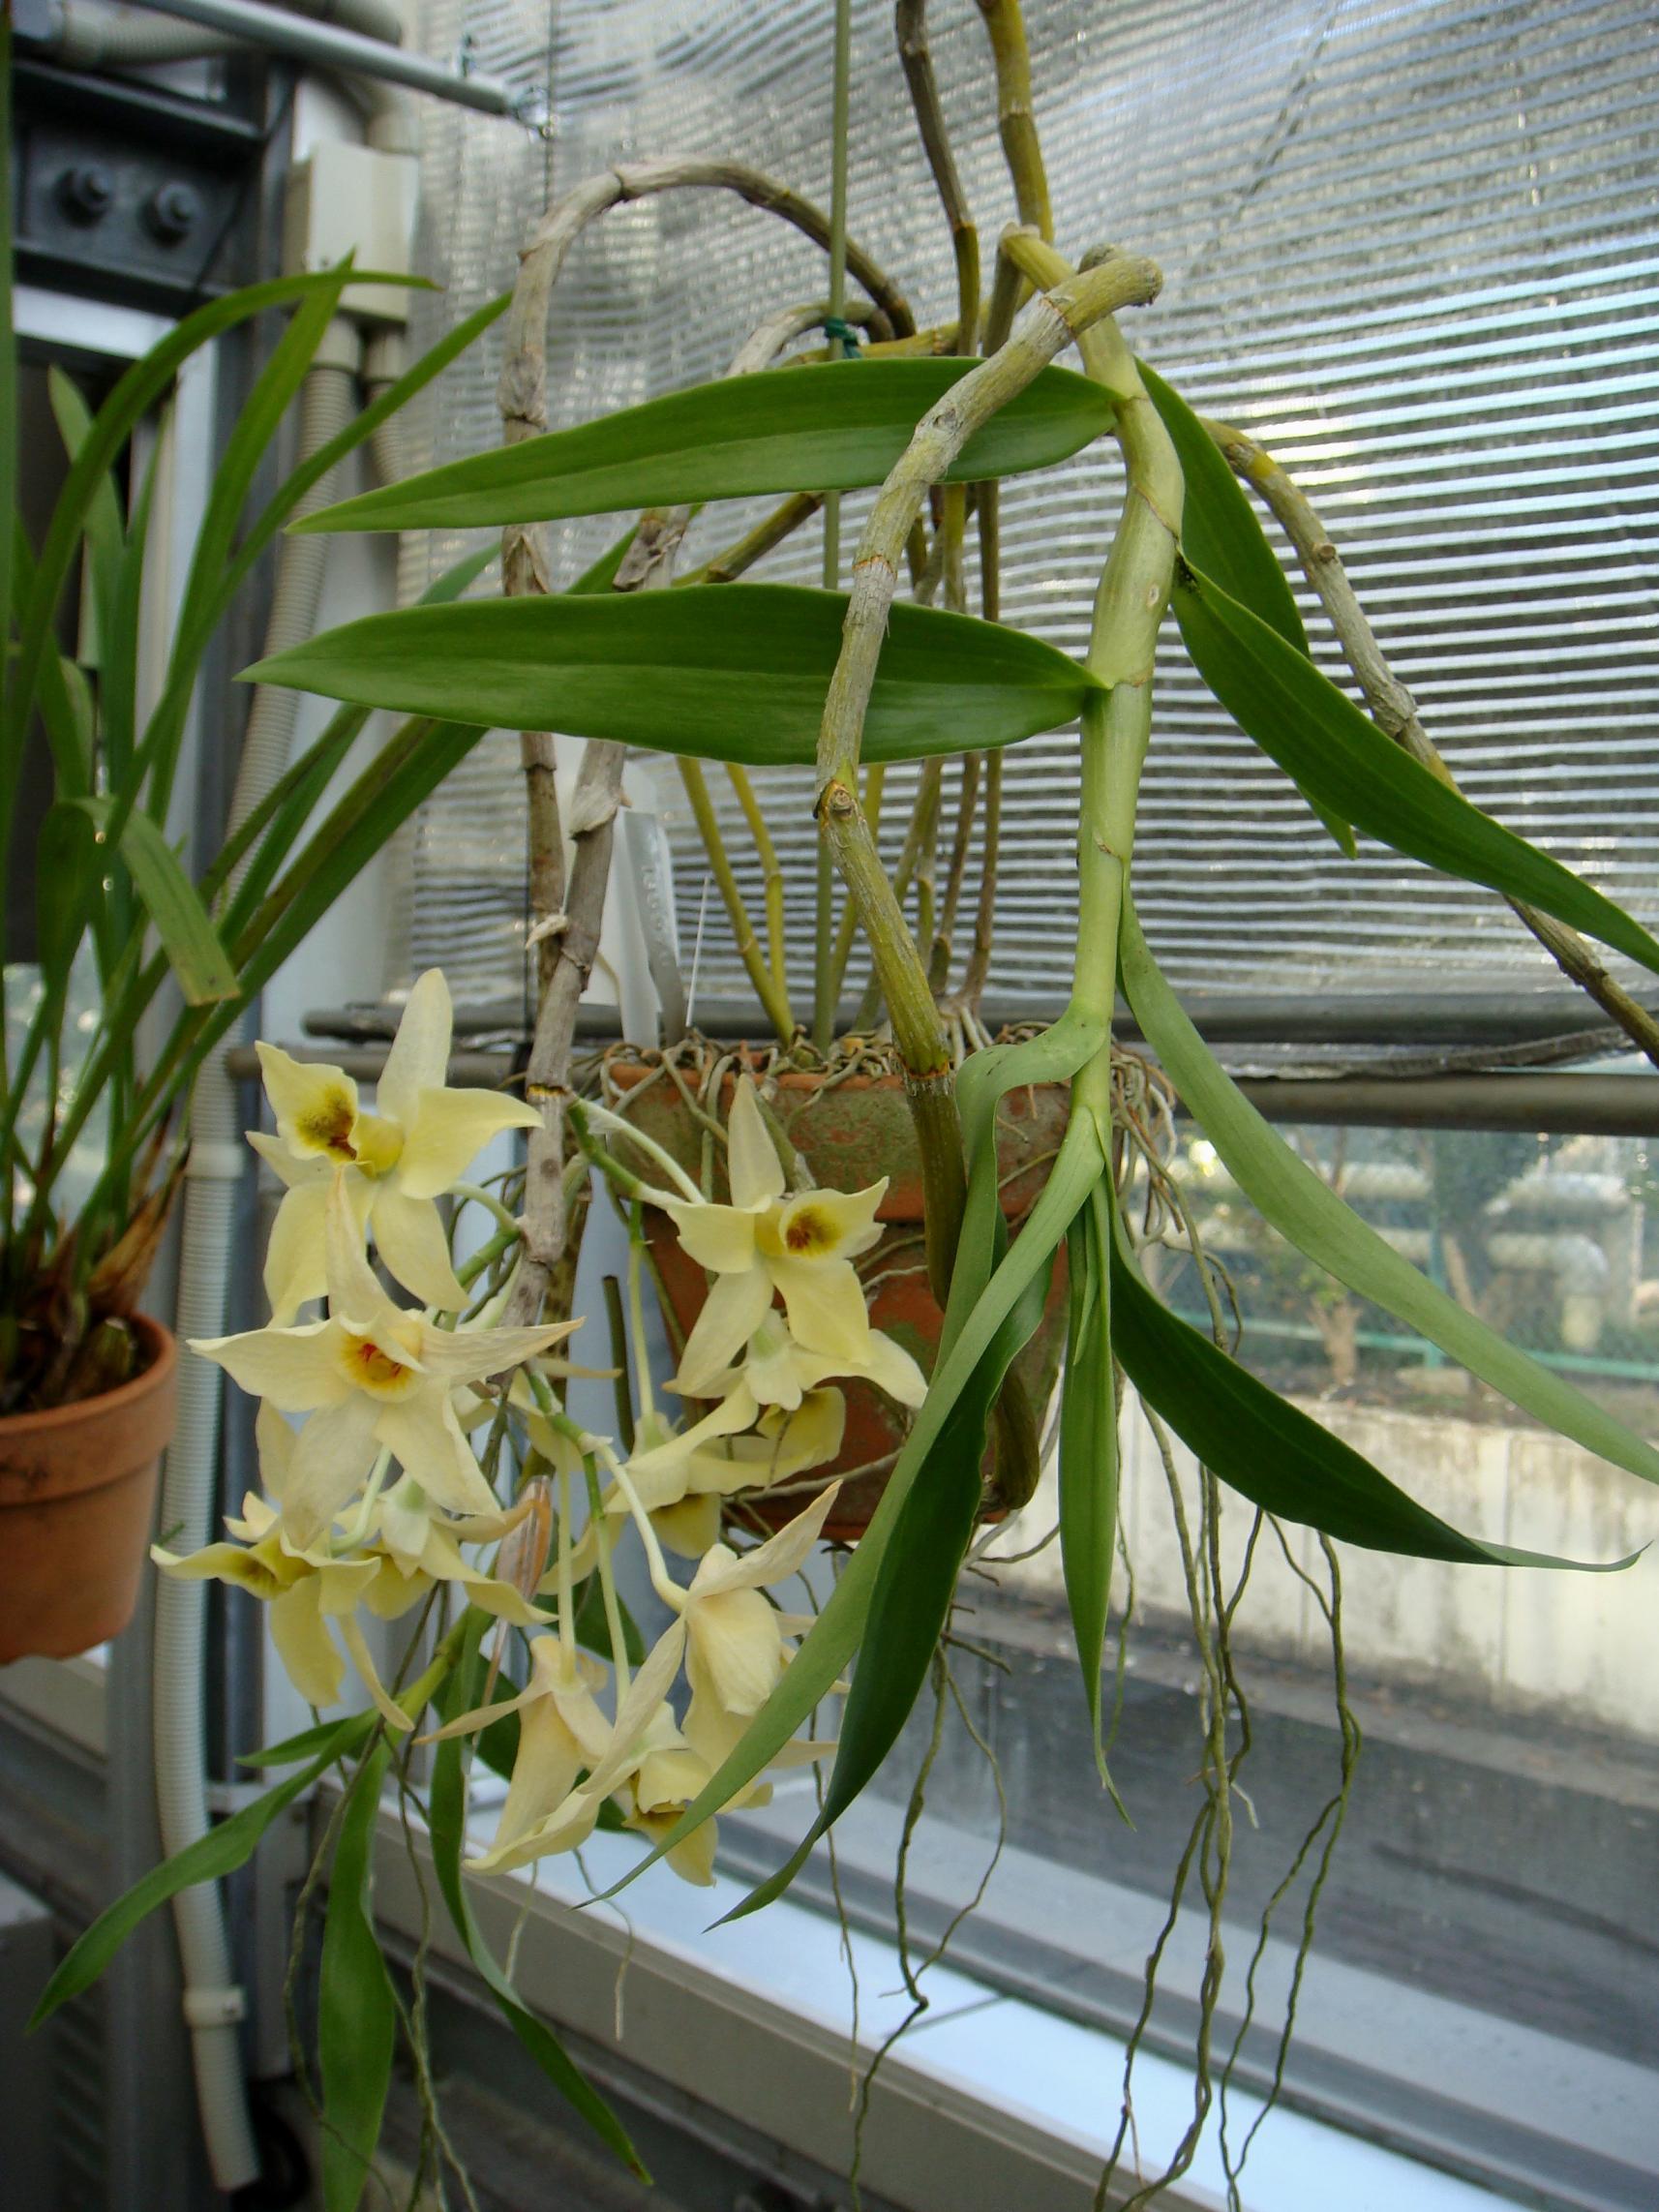 http://orchids.la.coocan.jp/Dendrobium/Dendrobium%20rhombeum/DSC04674.JPG